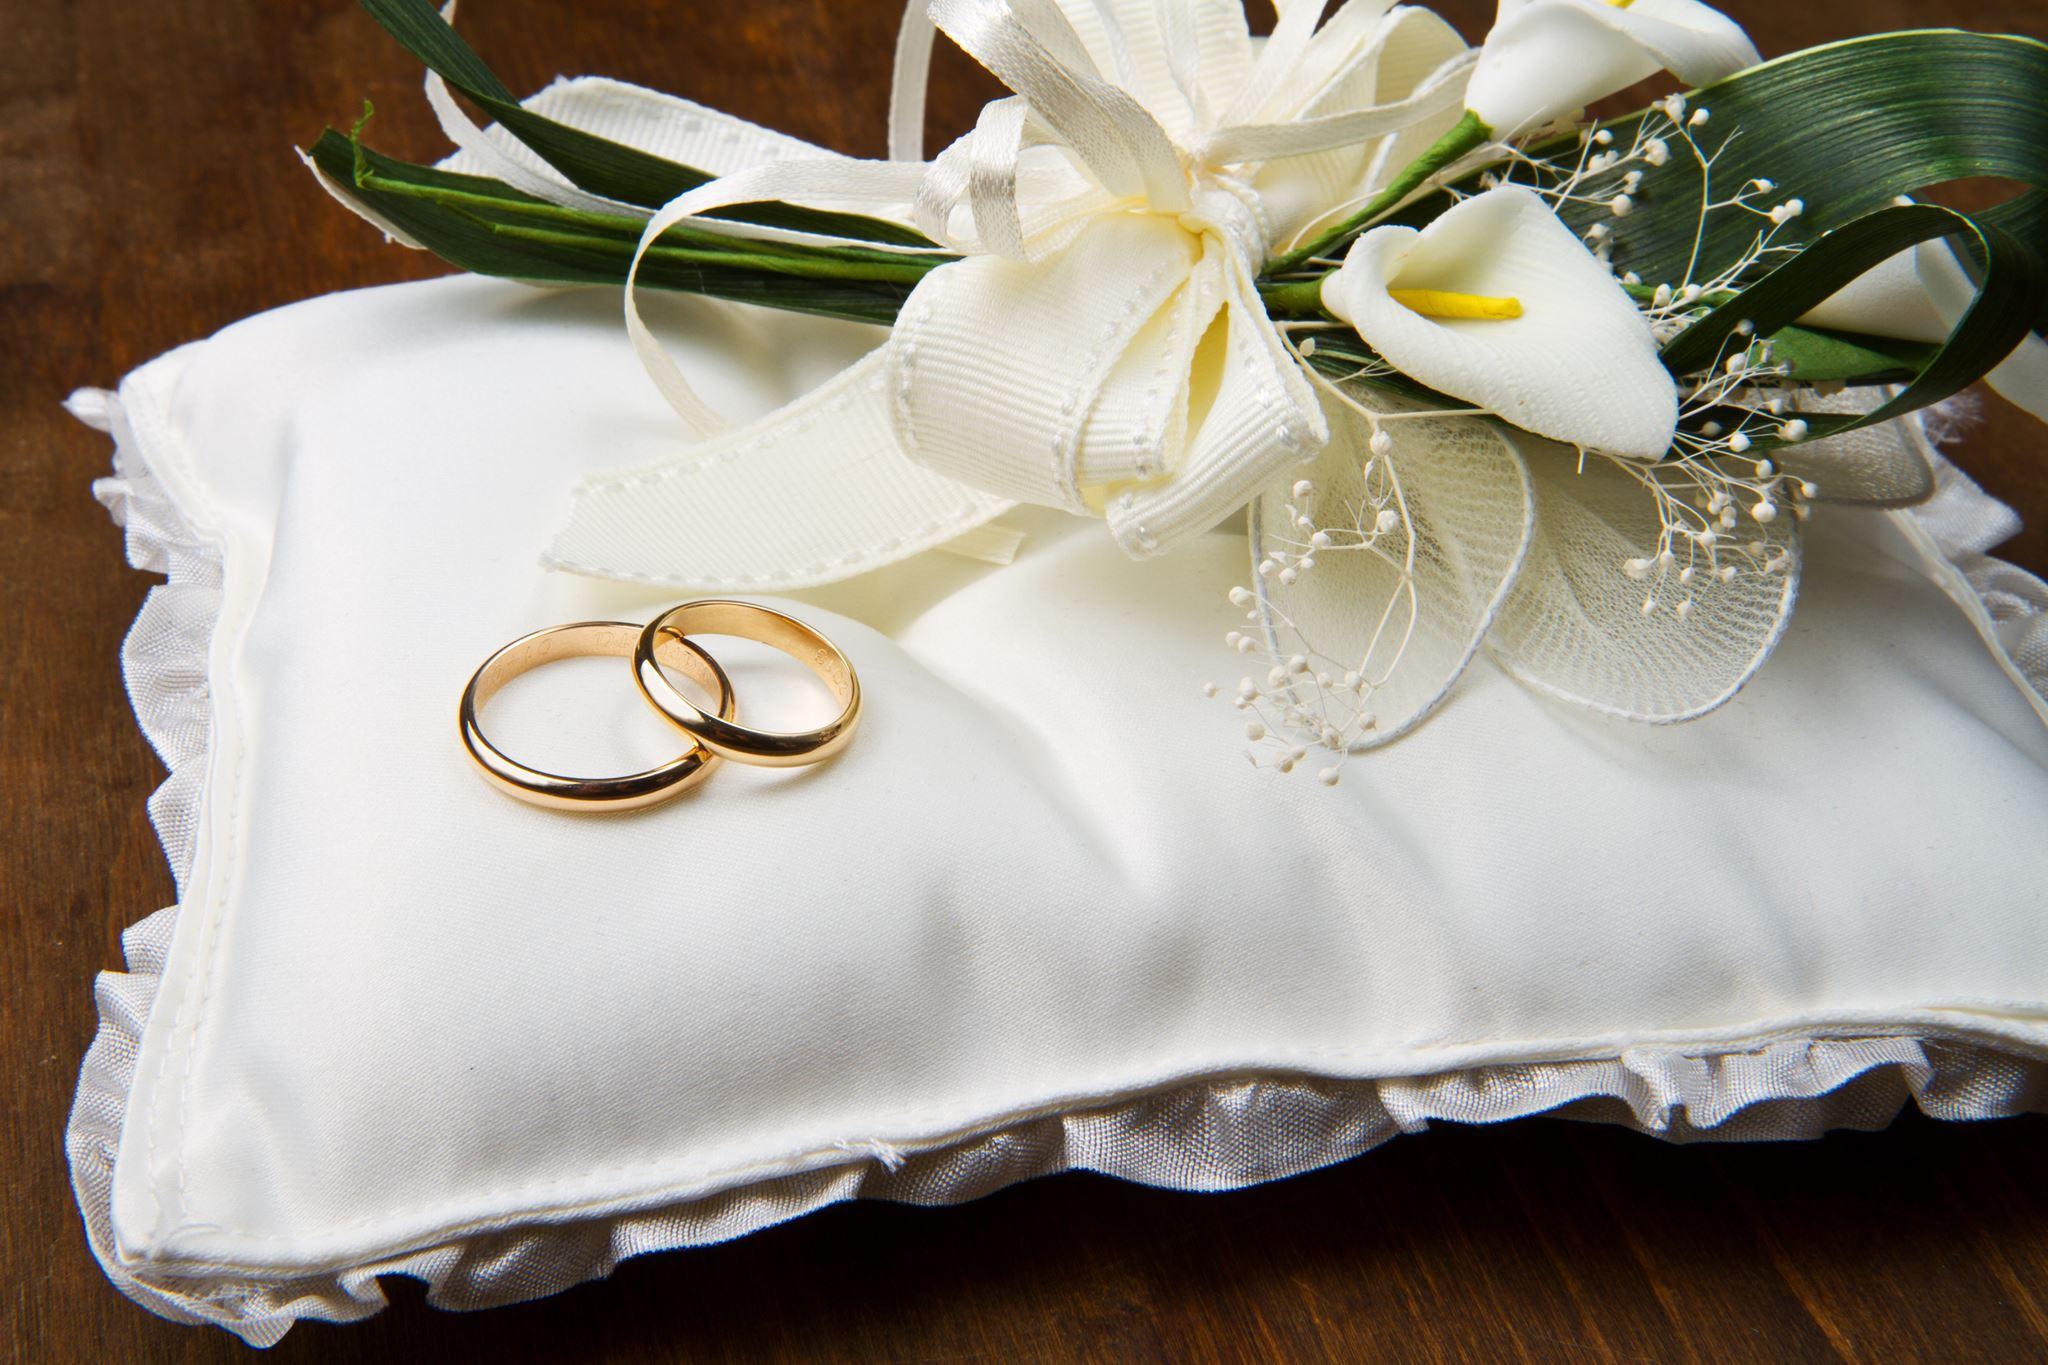 صور عريس وعروسه يوم الزفاف 14 صور عريس وعروسه يوم الزفاف